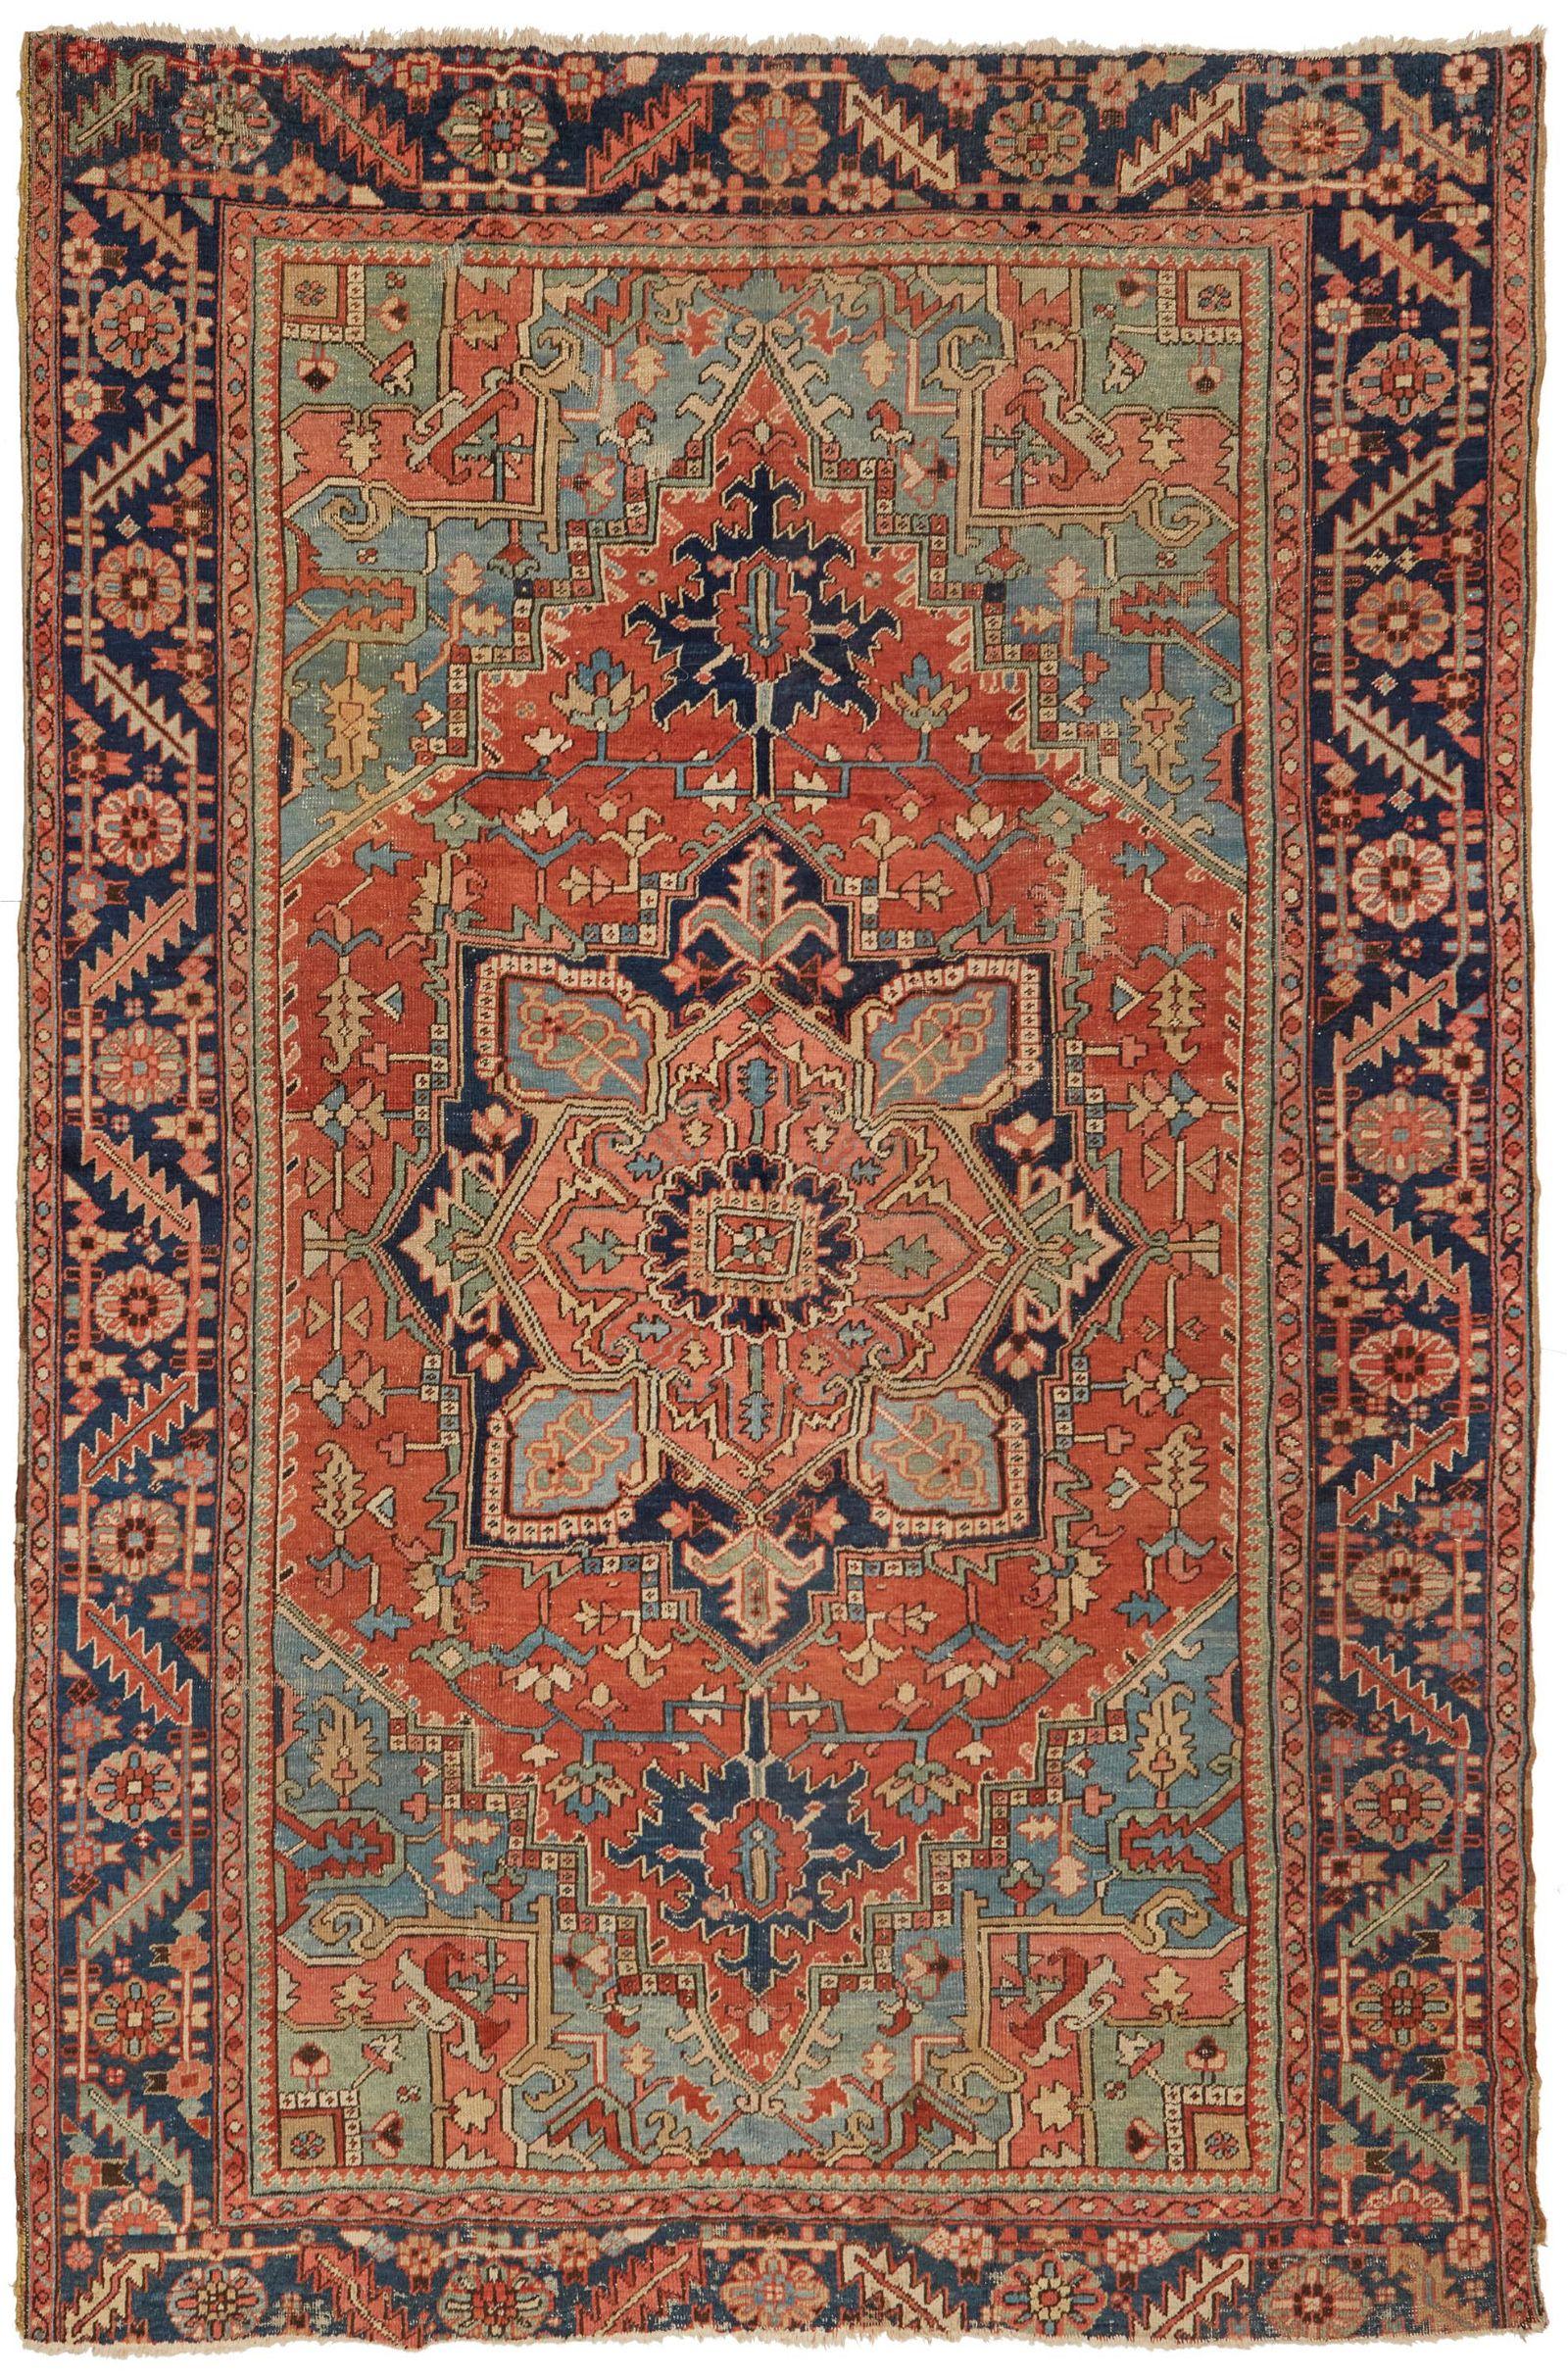 An Iranian Heriz area rug